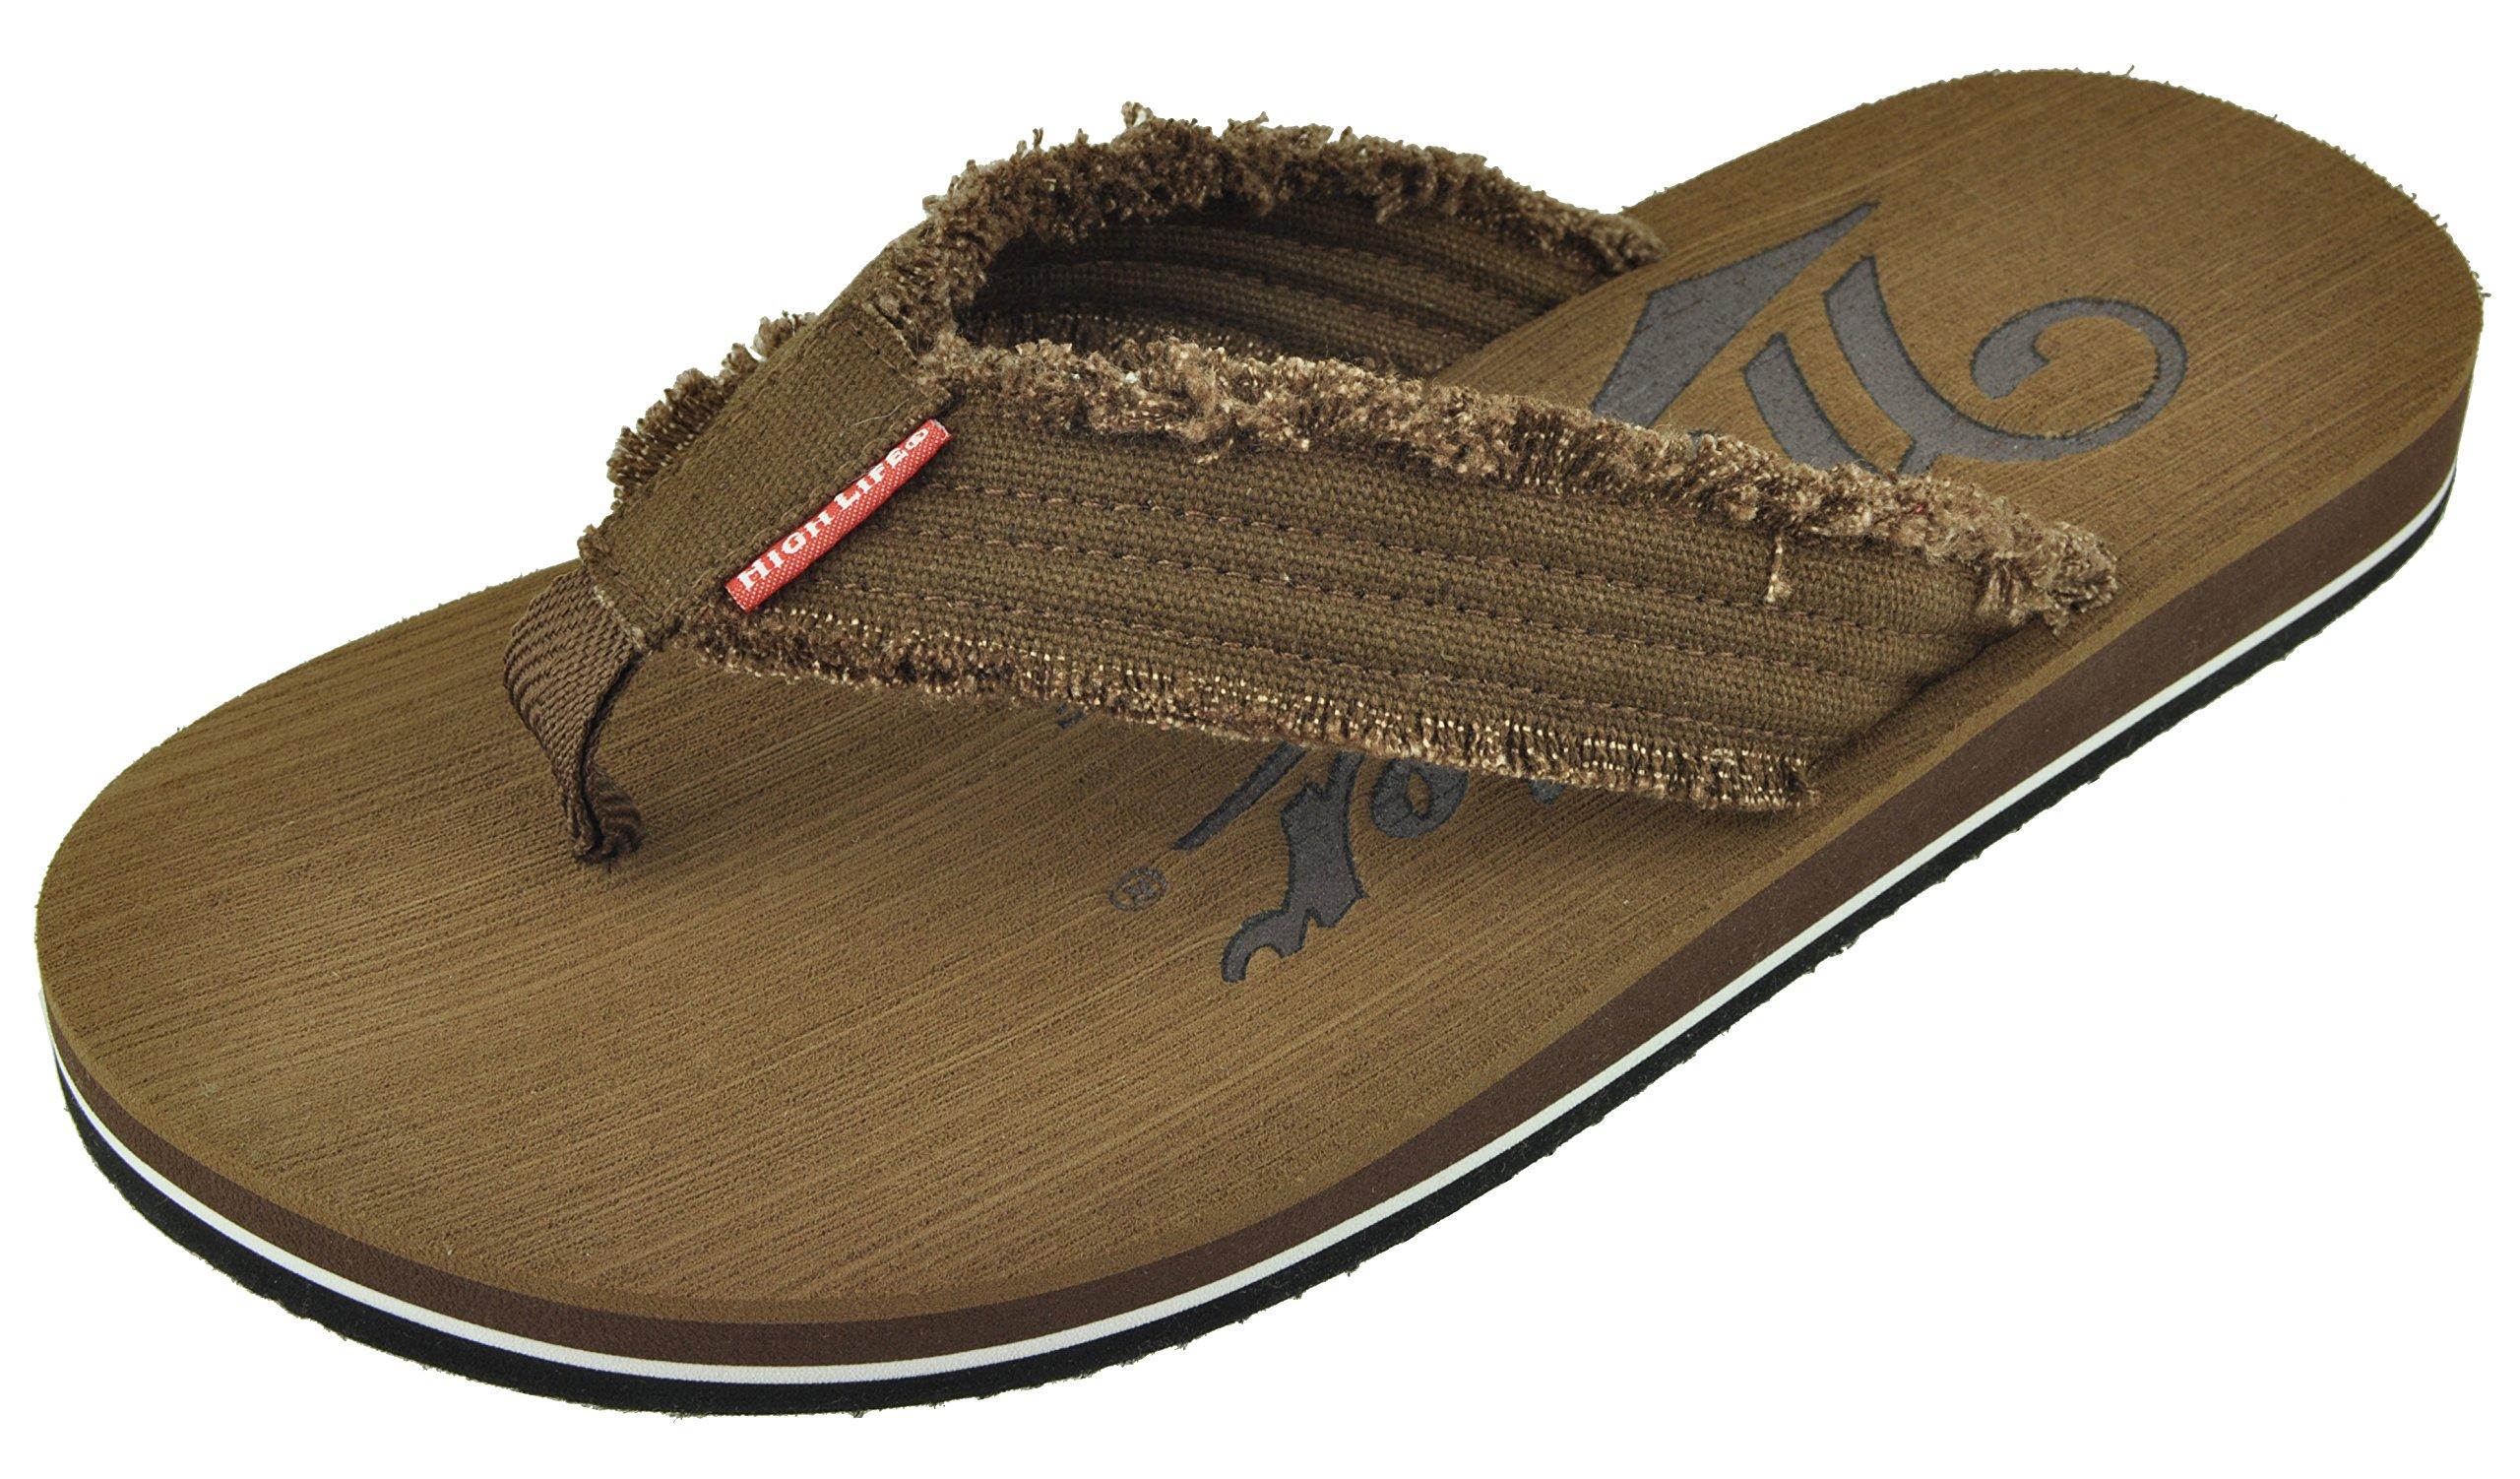 Miller High Life Beer Men's Classic Casual Summer Flip-Flop Sandals (Size LG 10-11)